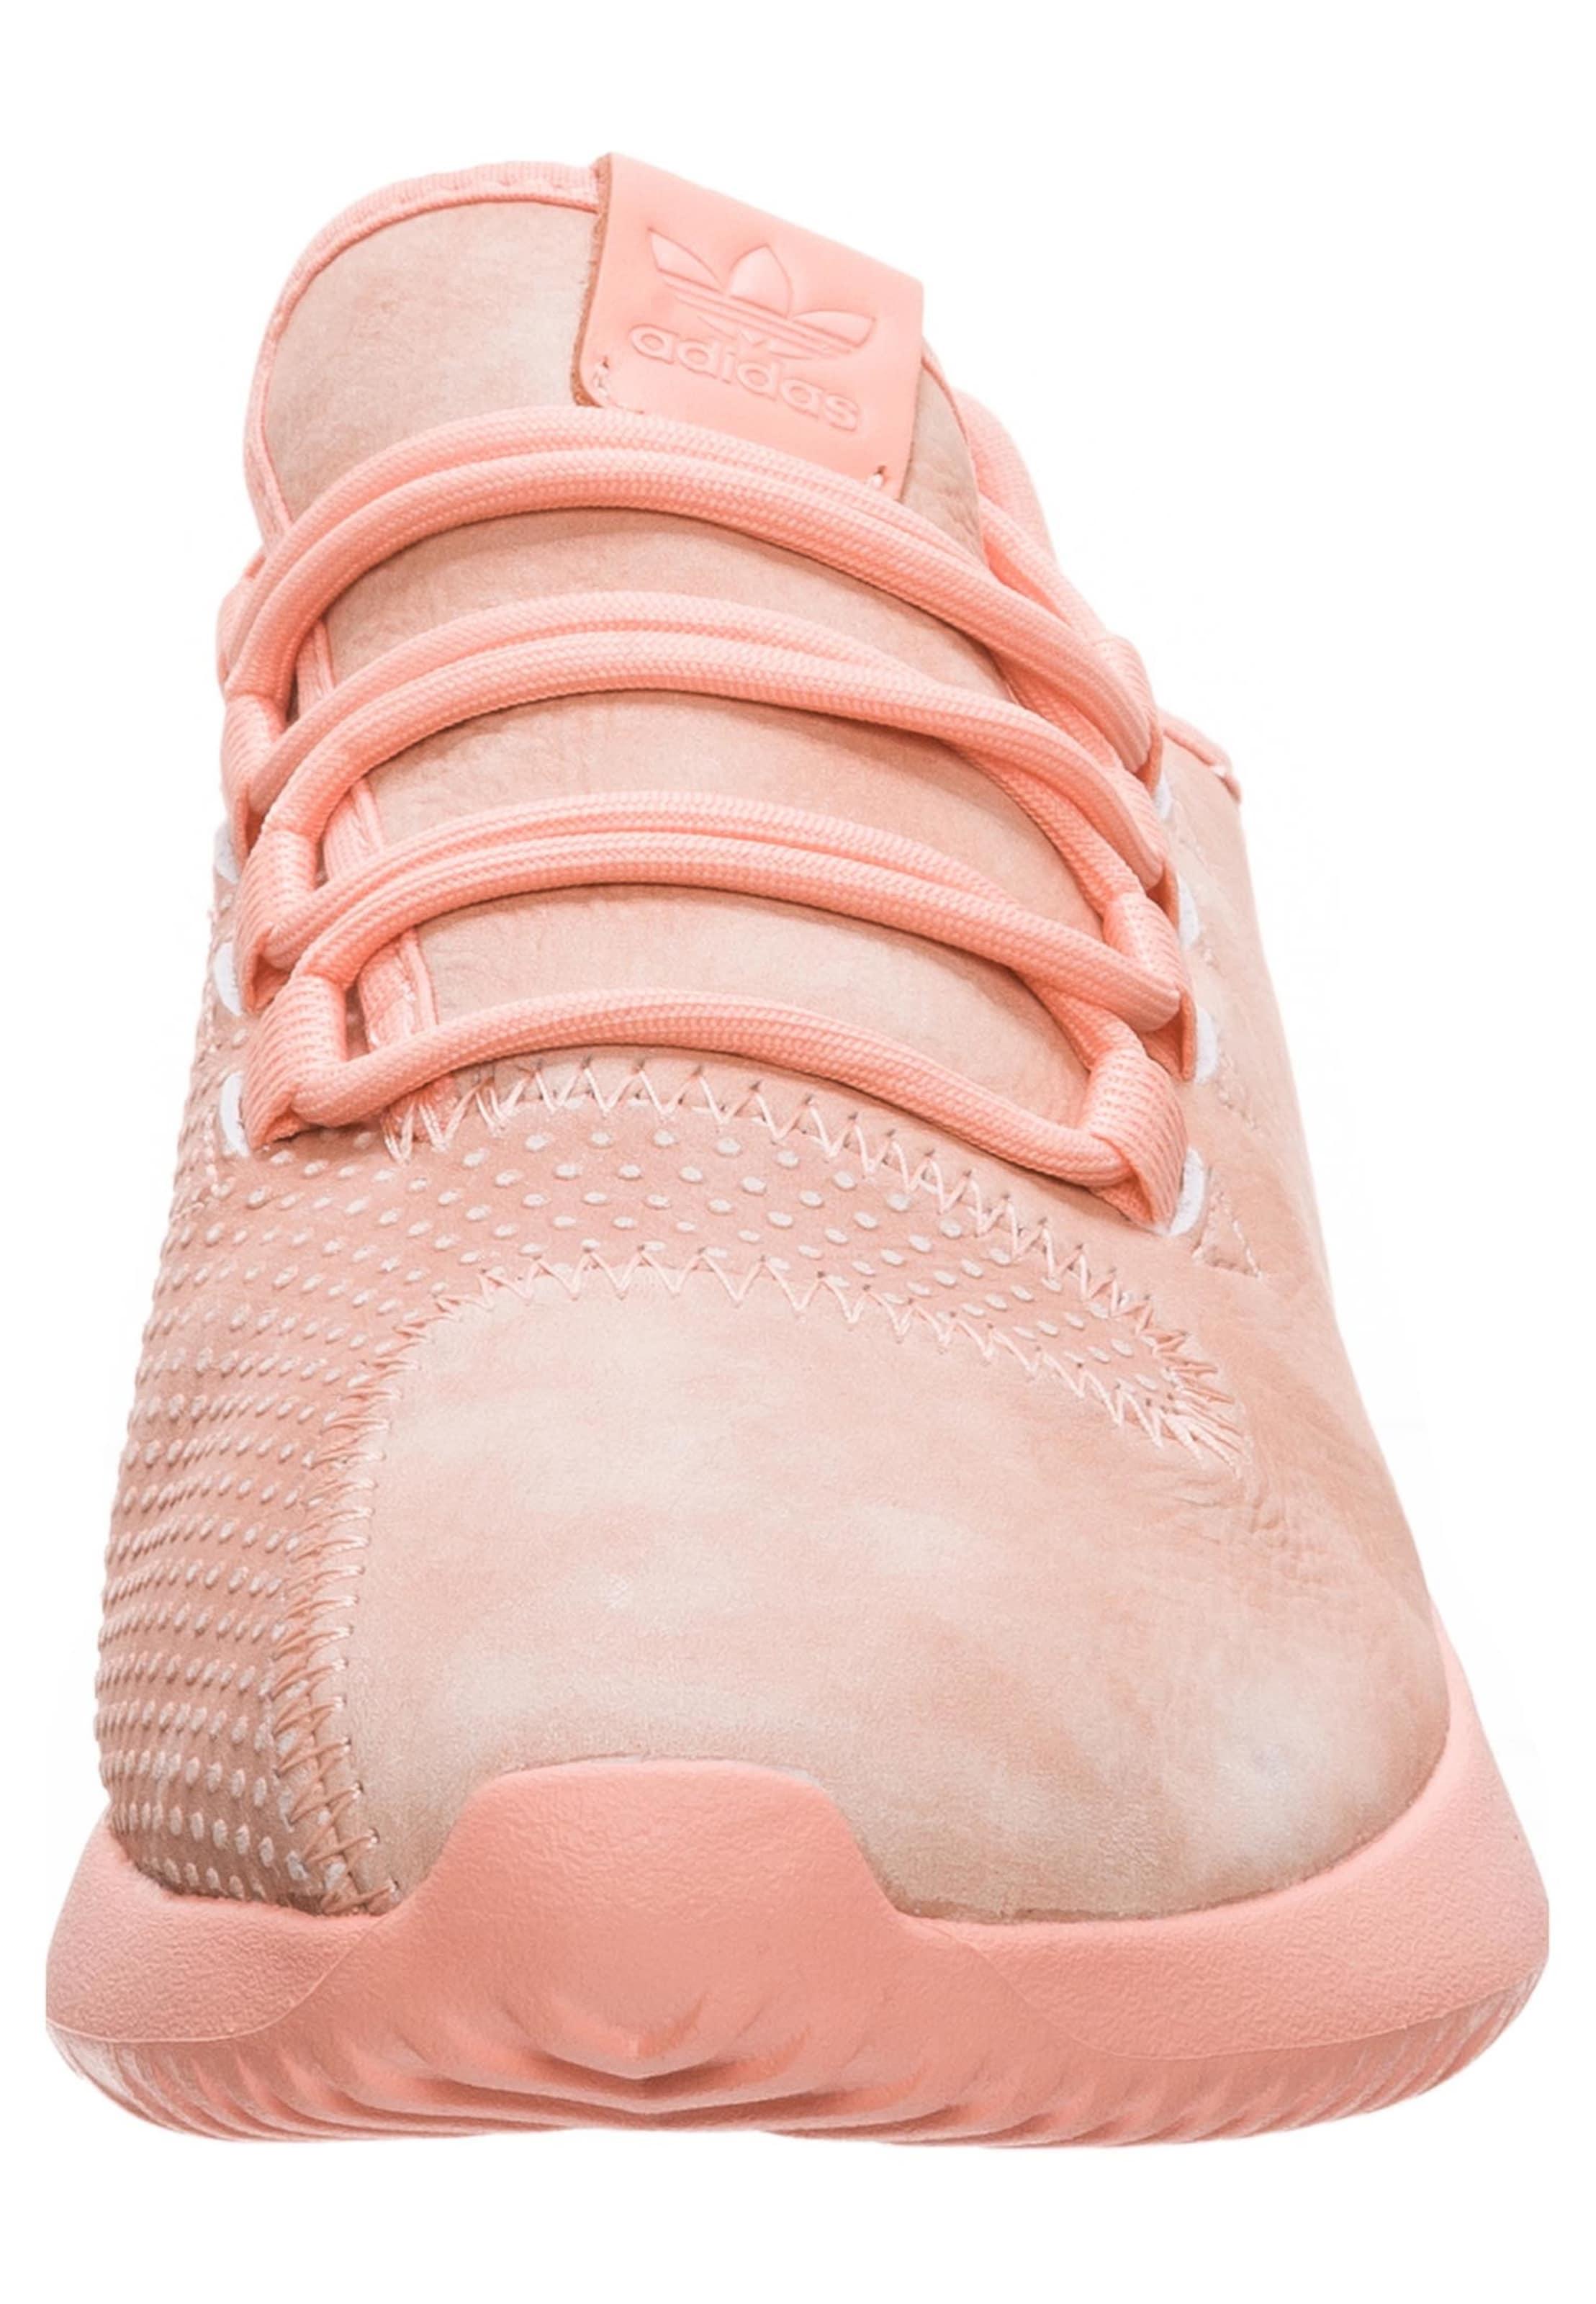 Adidas En Basses Rose ' Originals Shadow Baskets 'tubular JT5uK1cFl3